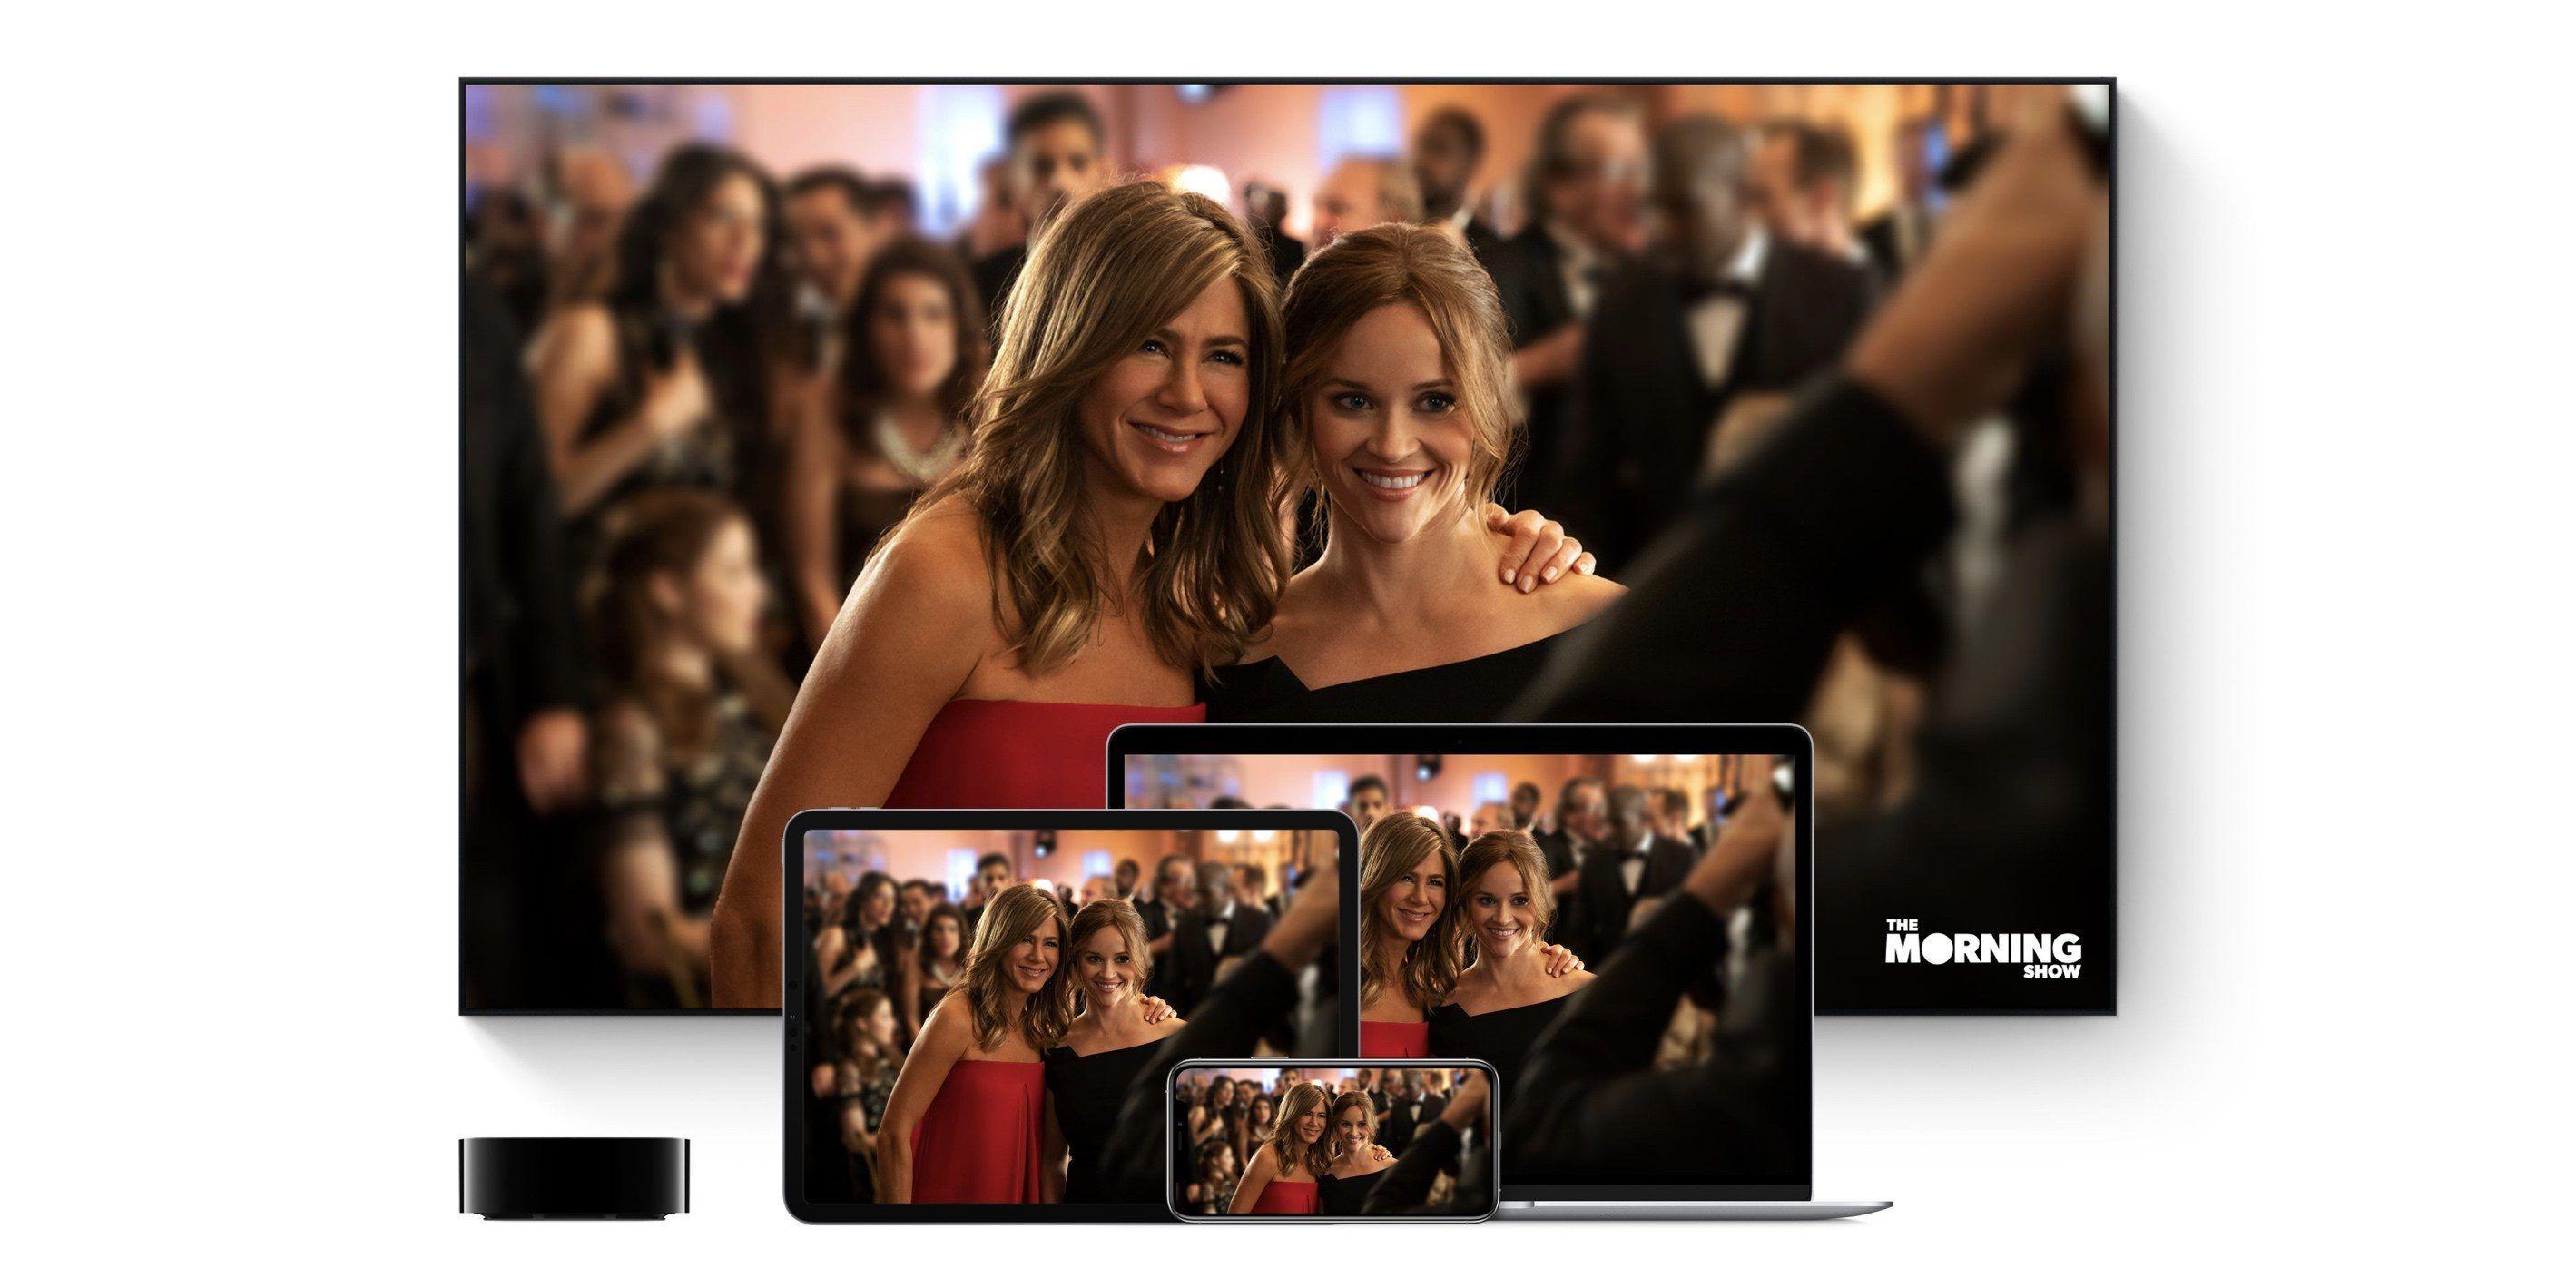 Where to watch Apple TV+ iPhone, iPad, Mac, Roku, Amazon